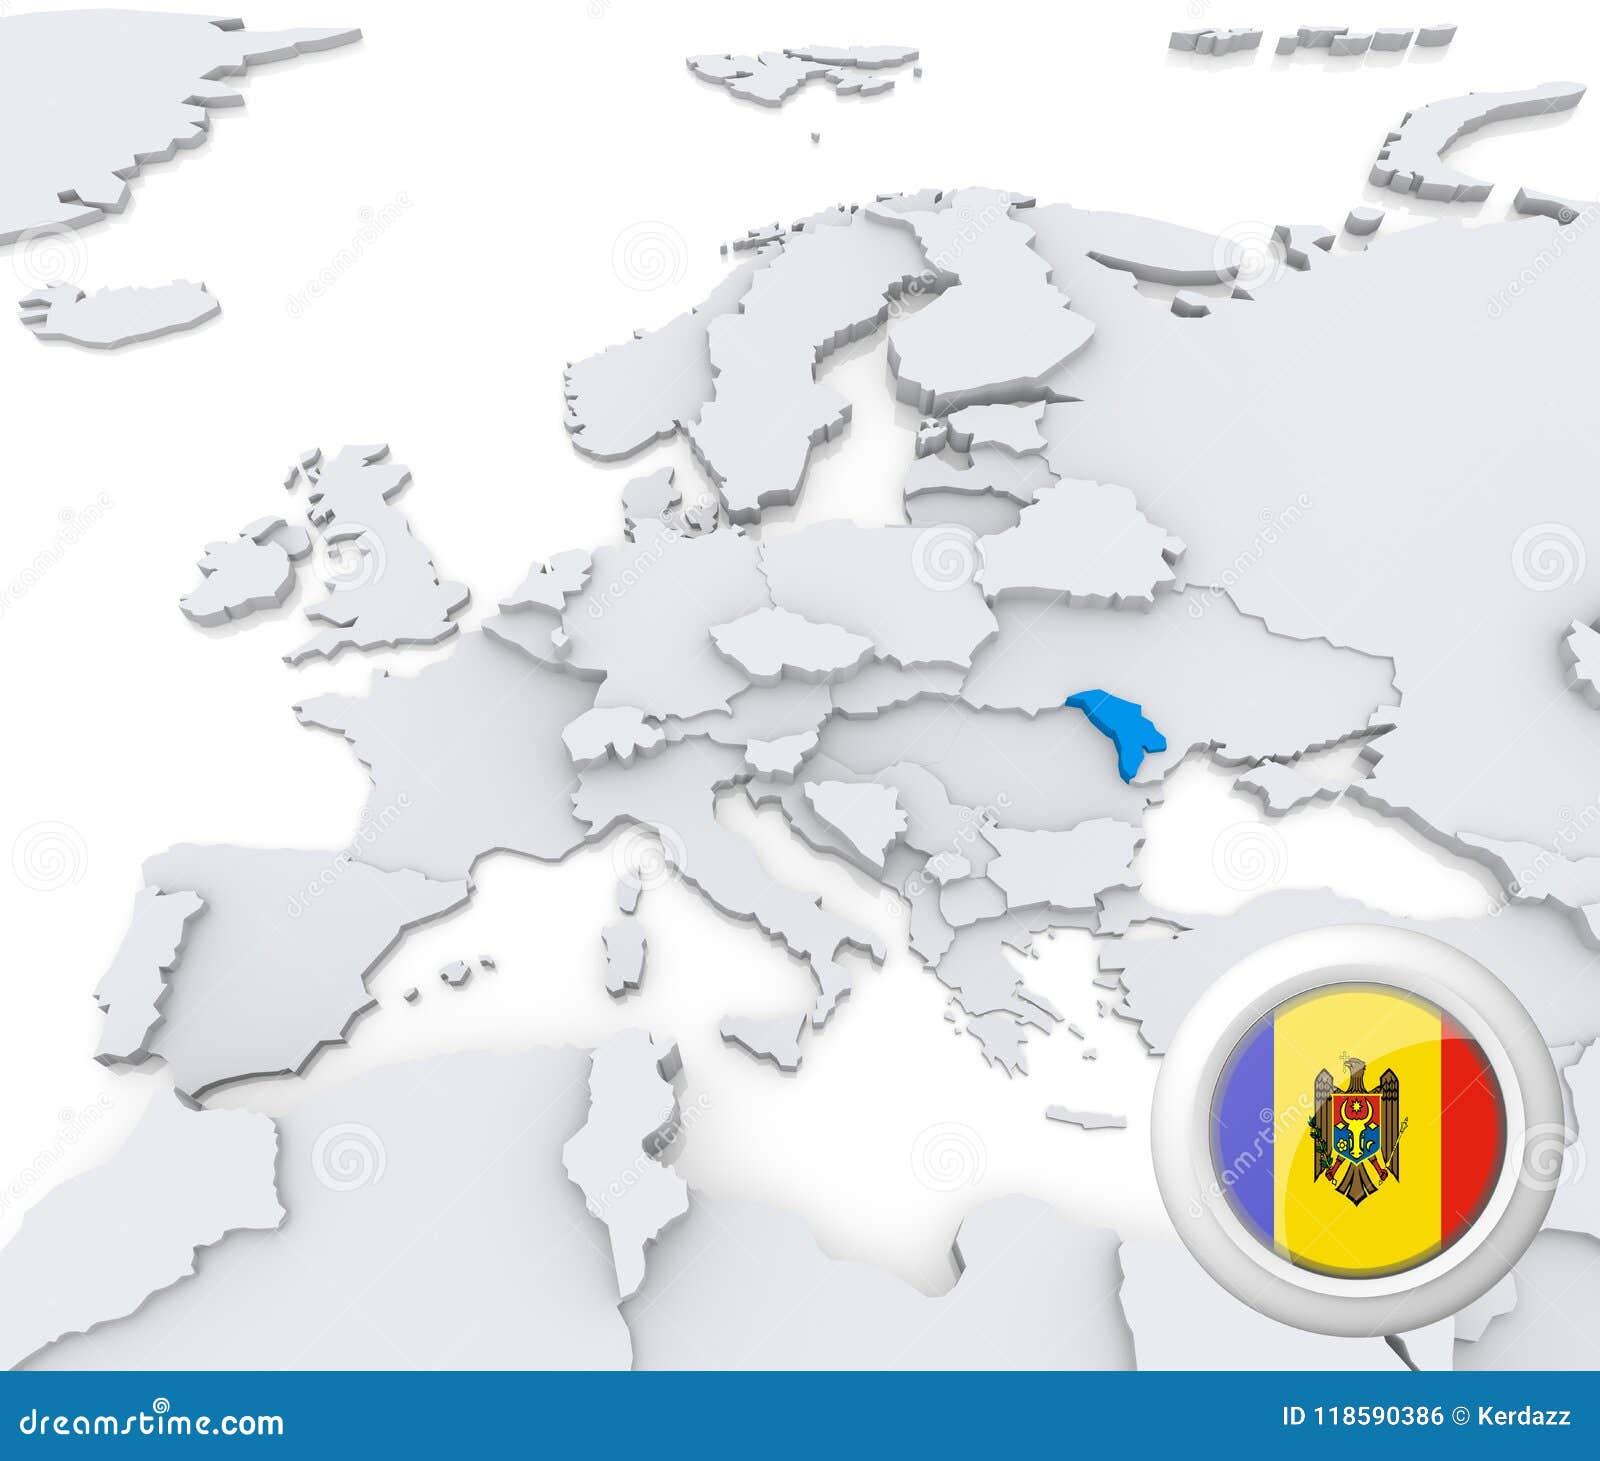 Moldova On Map Of Europe Stock Illustration Illustration Of Flag